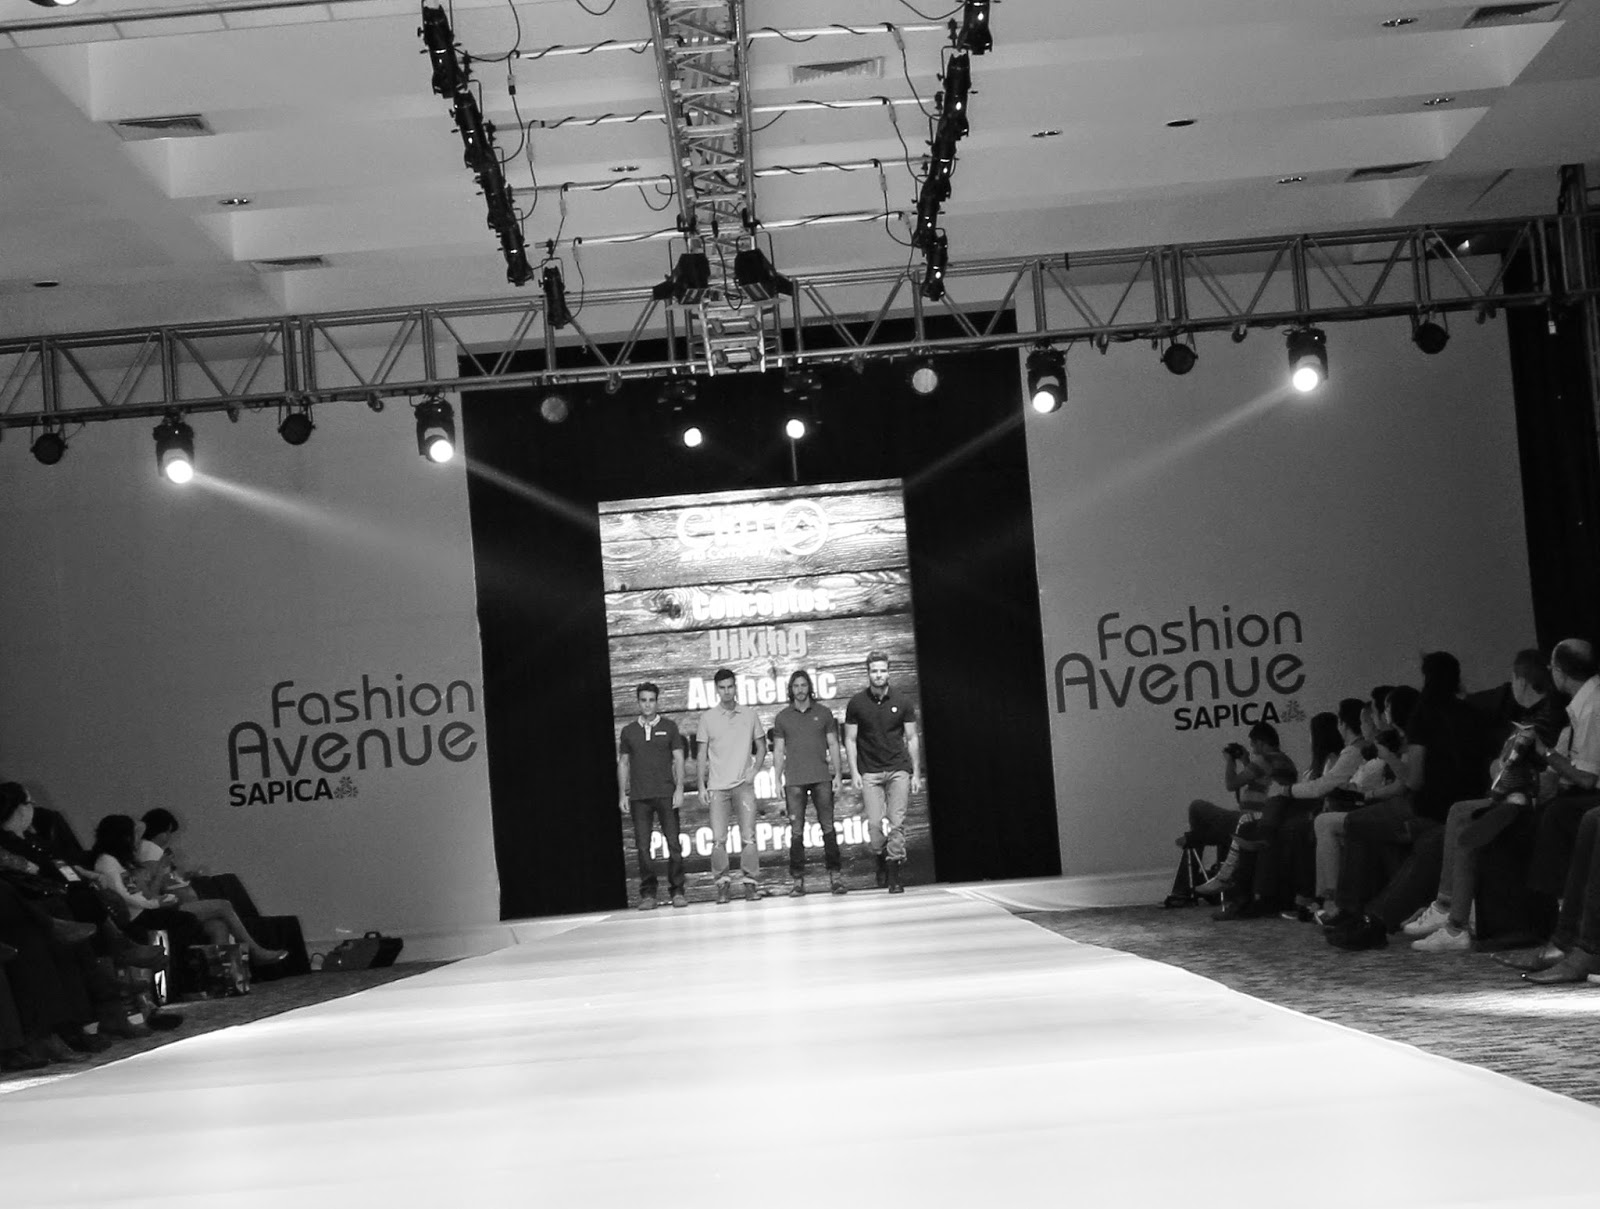 Calzado mexicano, moda, pasarelas comerciales, sapica, fashion avenue sapica, poliforum.